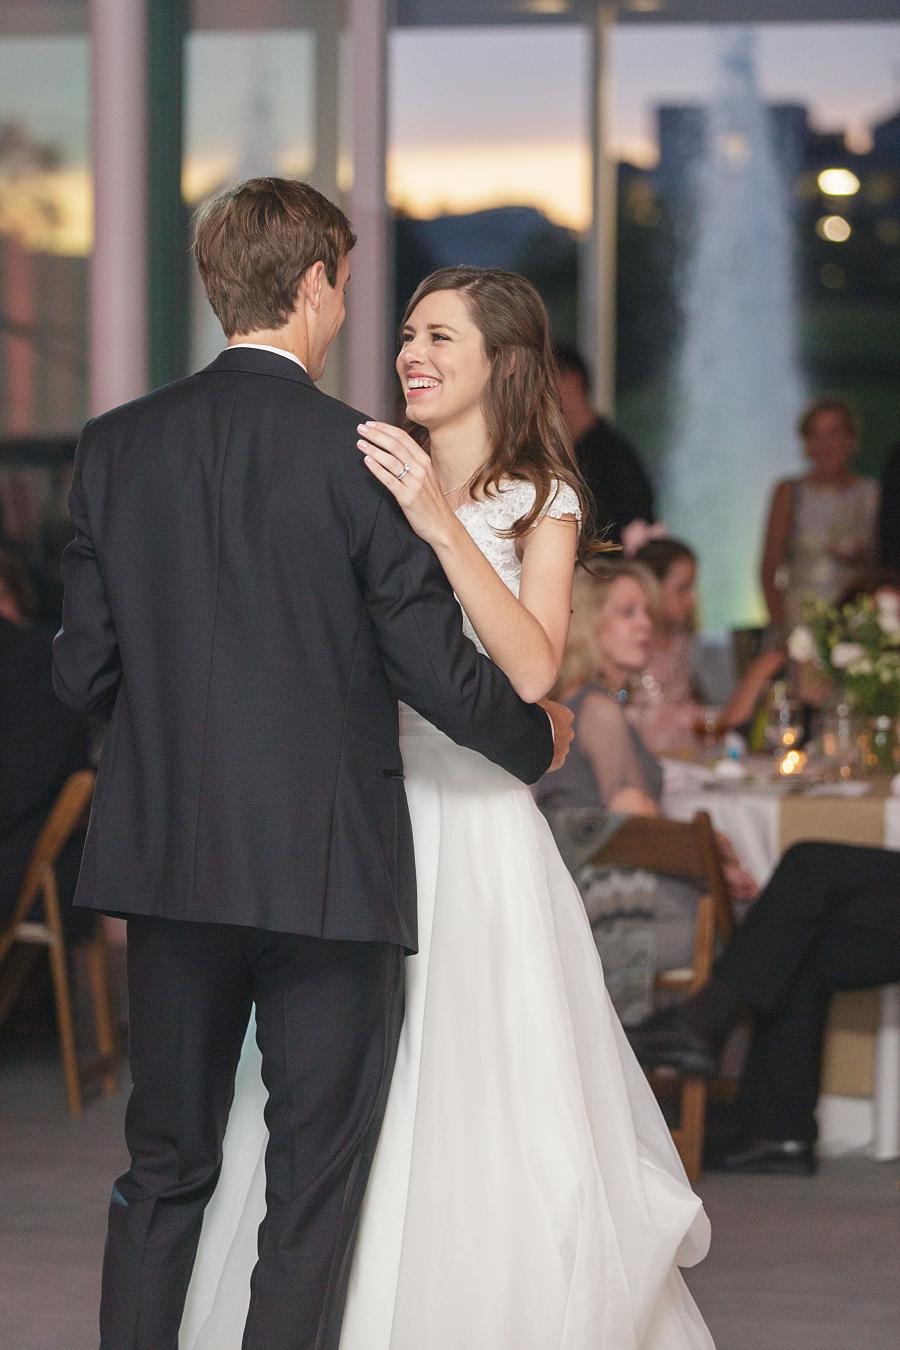 Stacy-Anderson-Photography-McGovern-Centennial-Gardens-Houston-Wedding-Photographer_0073.jpg